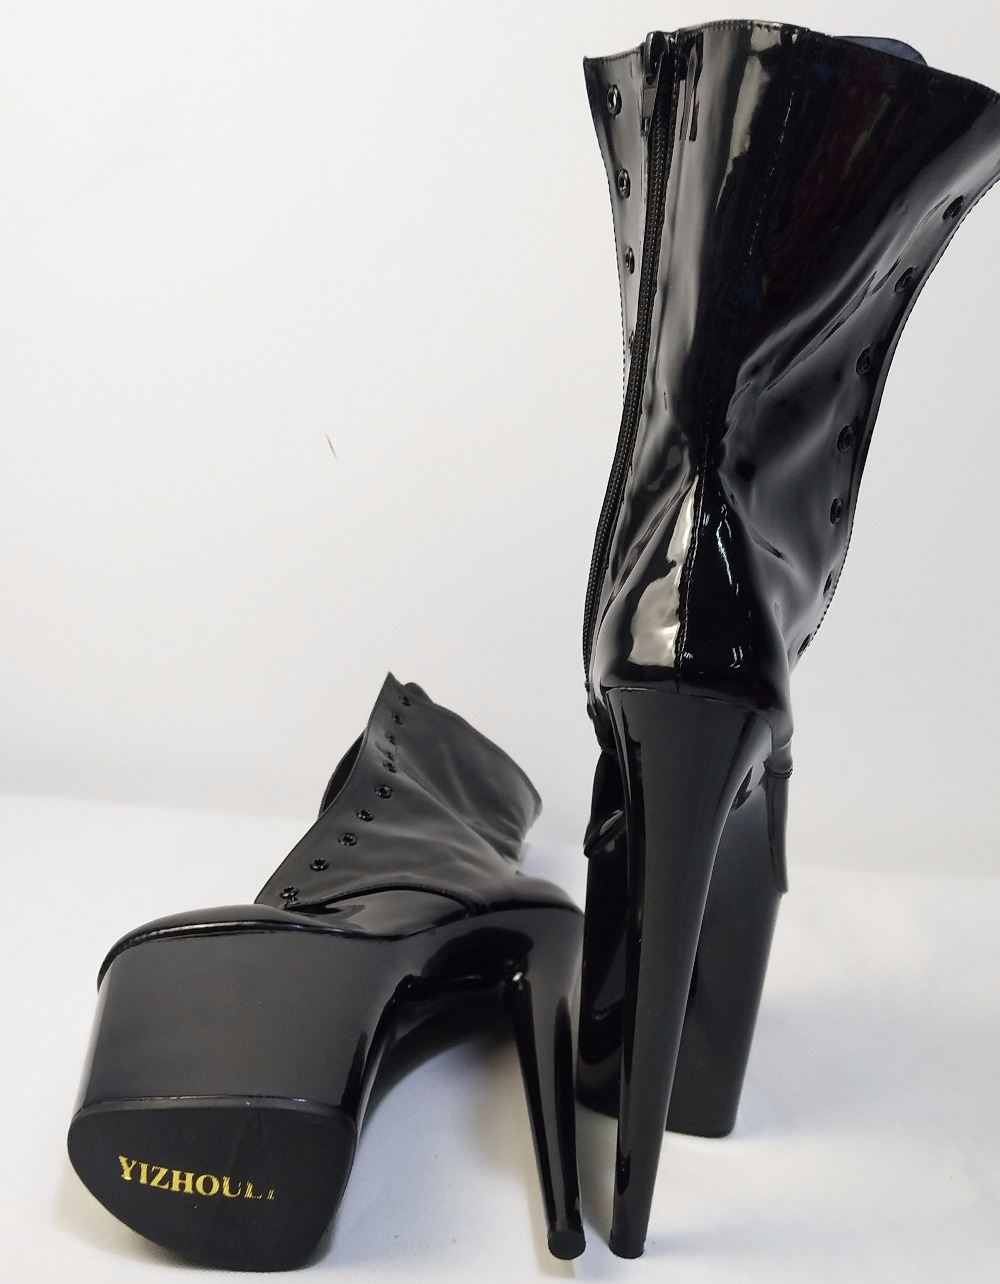 Busana Seksi Ksatria Wanita 8 Inch Tinggi Heel Platform Ankle Boots Qampampq Resin Analog Jam Tangan Hitam Strap Karet Vq04j010y C011 6